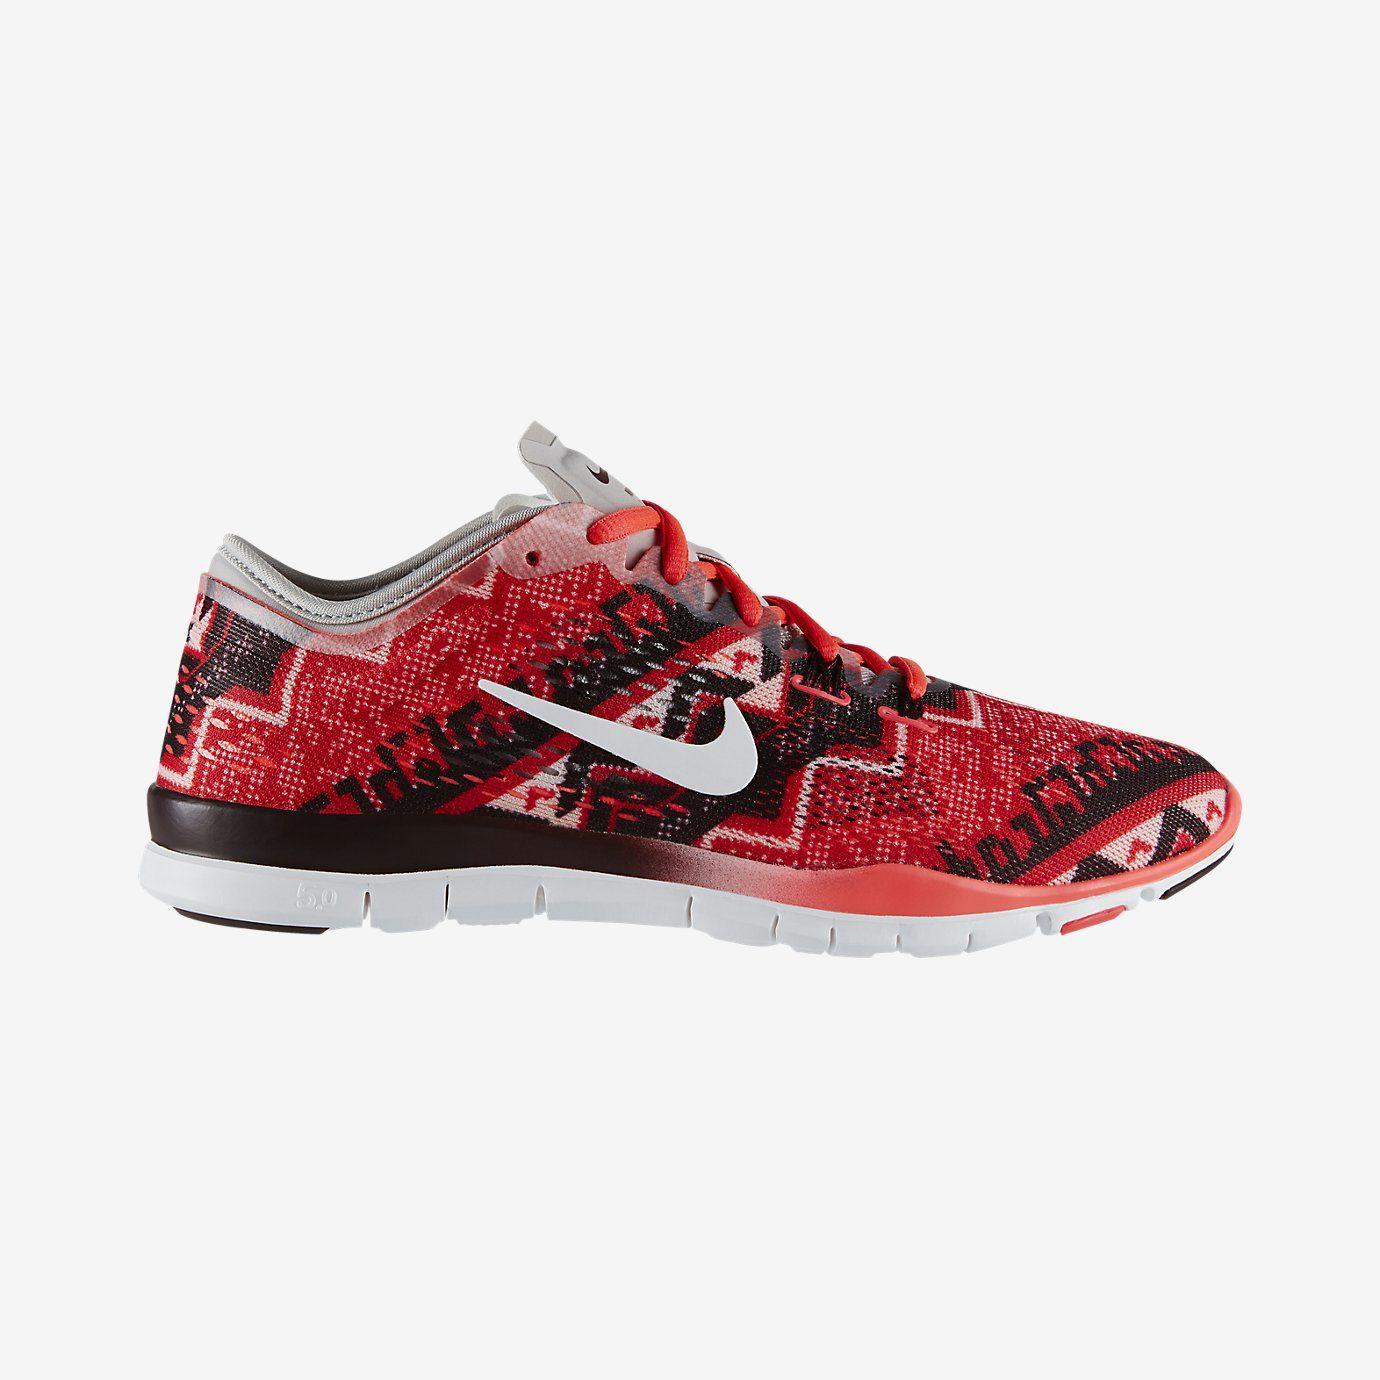 uk availability 281fc e8cce ... Nike Free TR Fit 4 Print – Chaussure de training pour Femme. Nike Store  FR Nike Free 5.0 ...